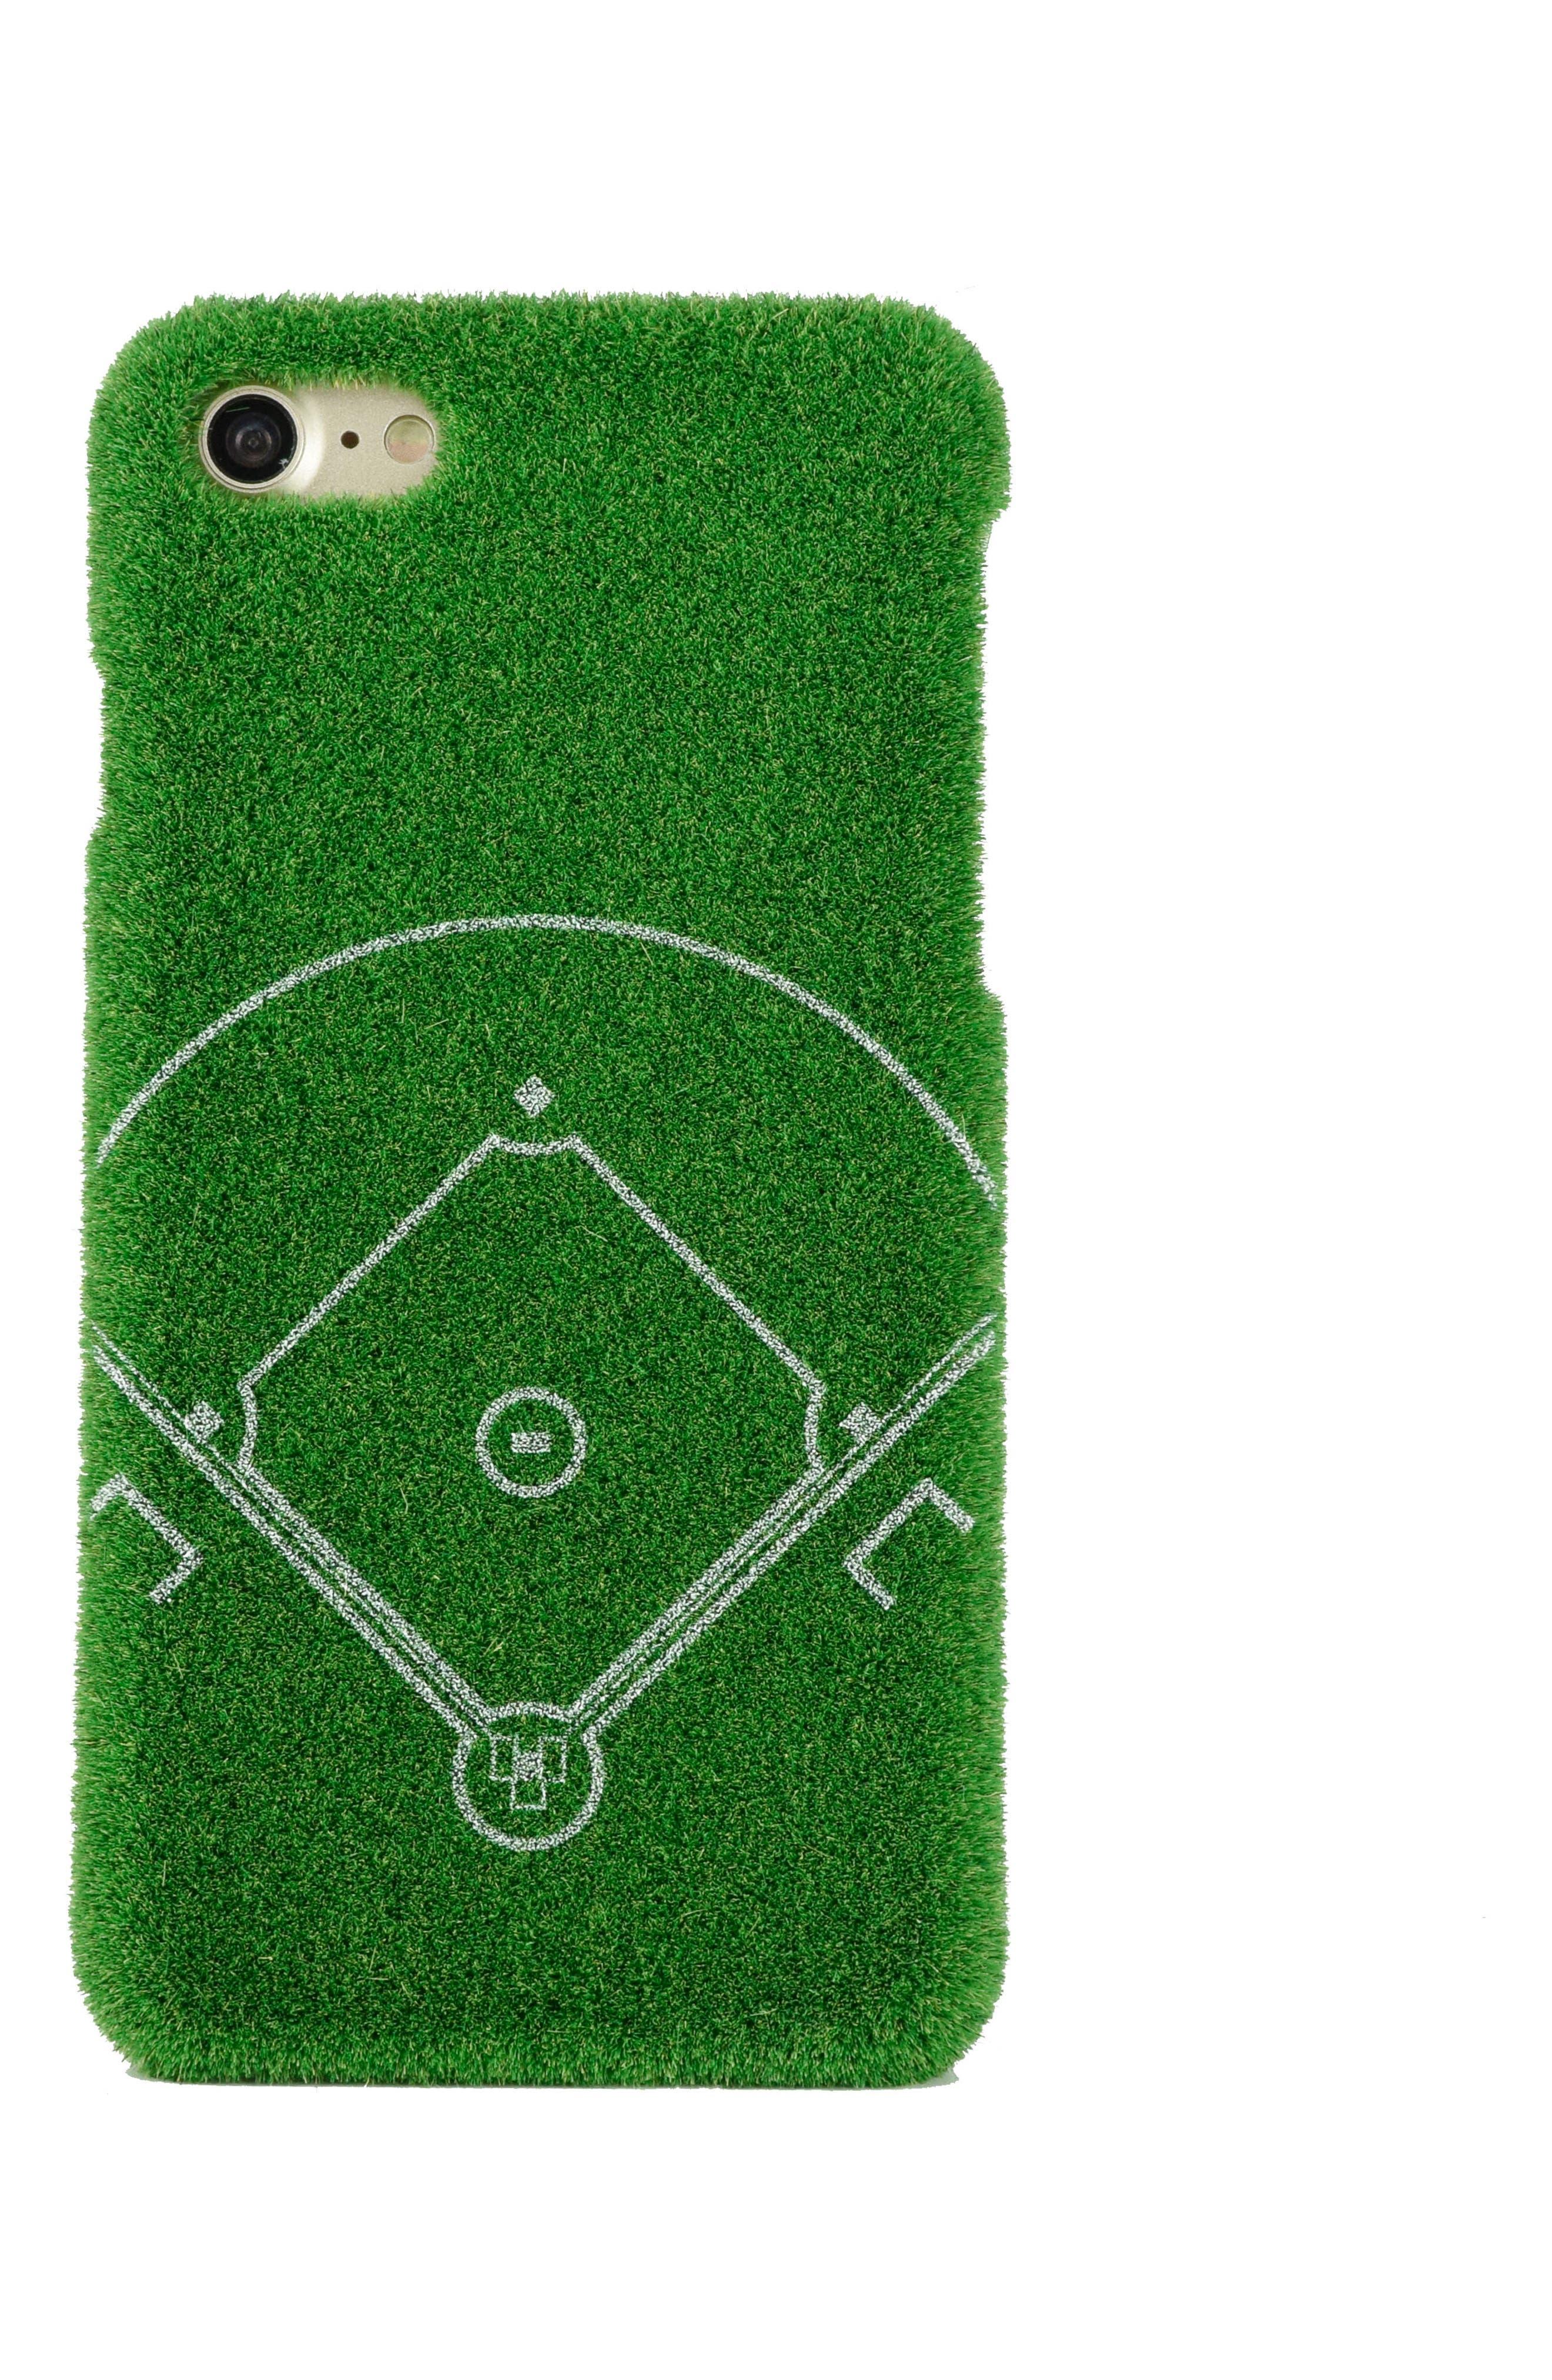 SHIBAFUL Dream Field Portable Park iPhone 7 & iPhone 7 Plus Case